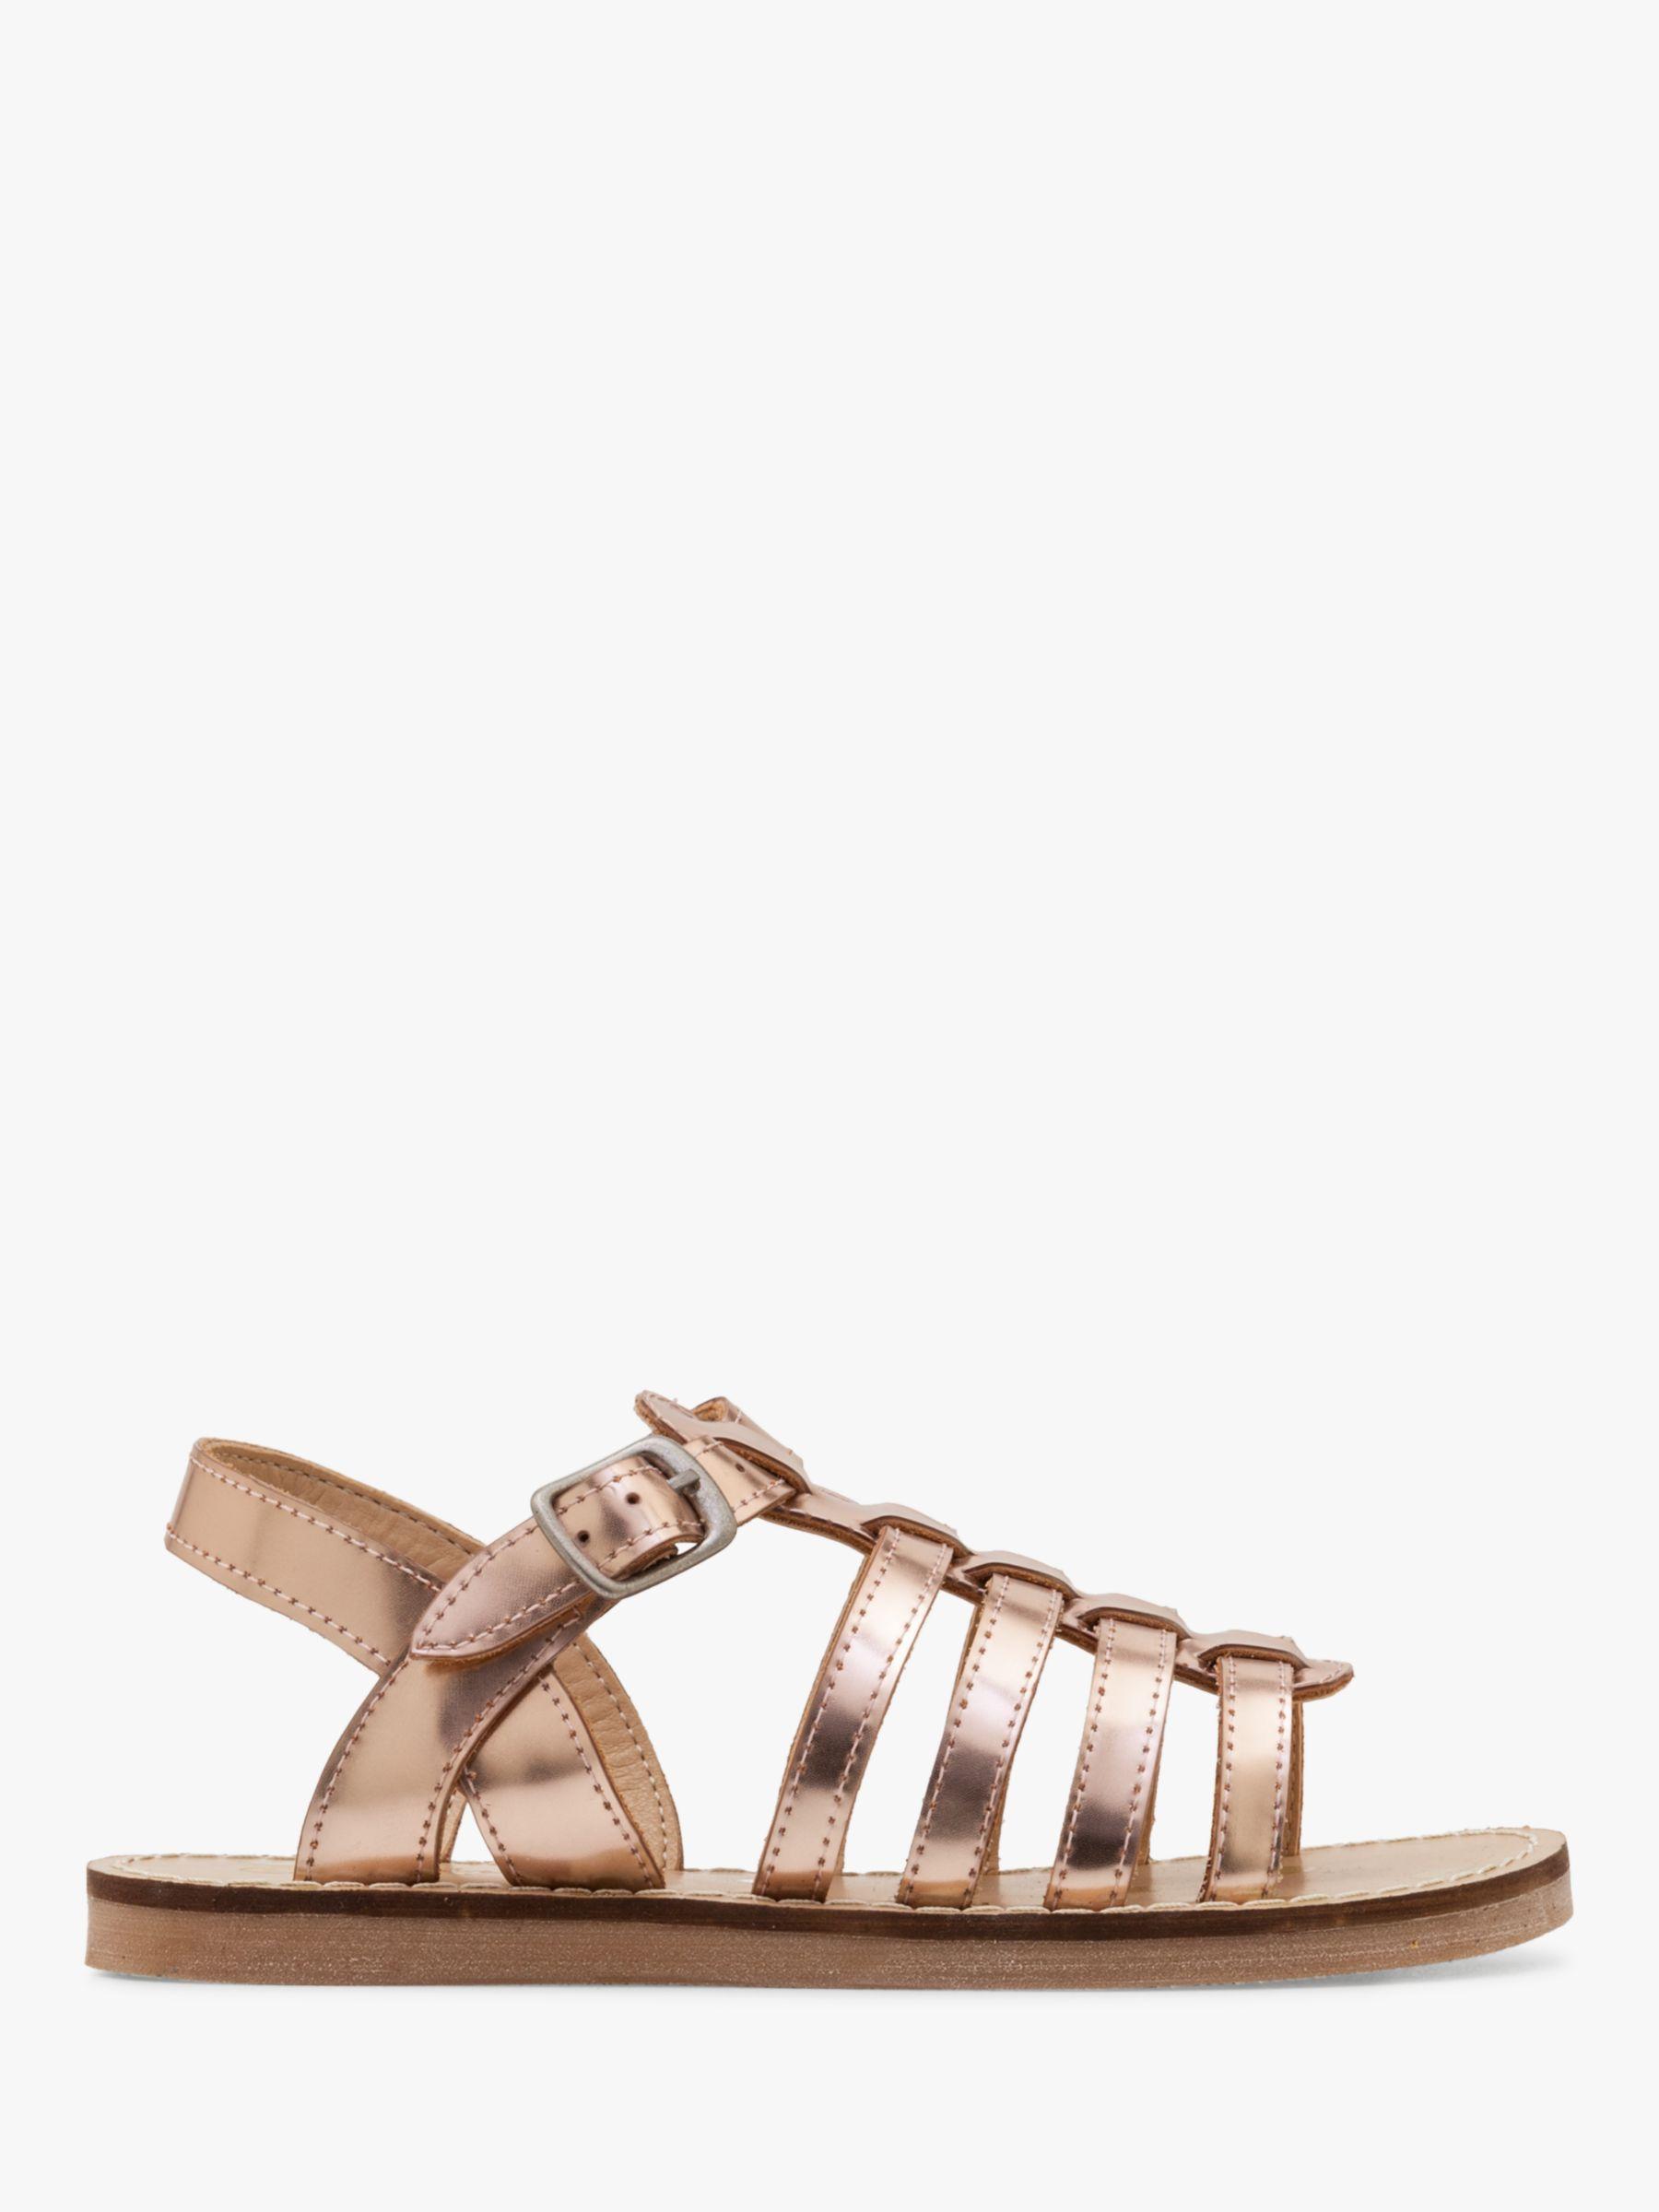 Mini Boden Mini Boden Children's Leather Gladiator Sandals